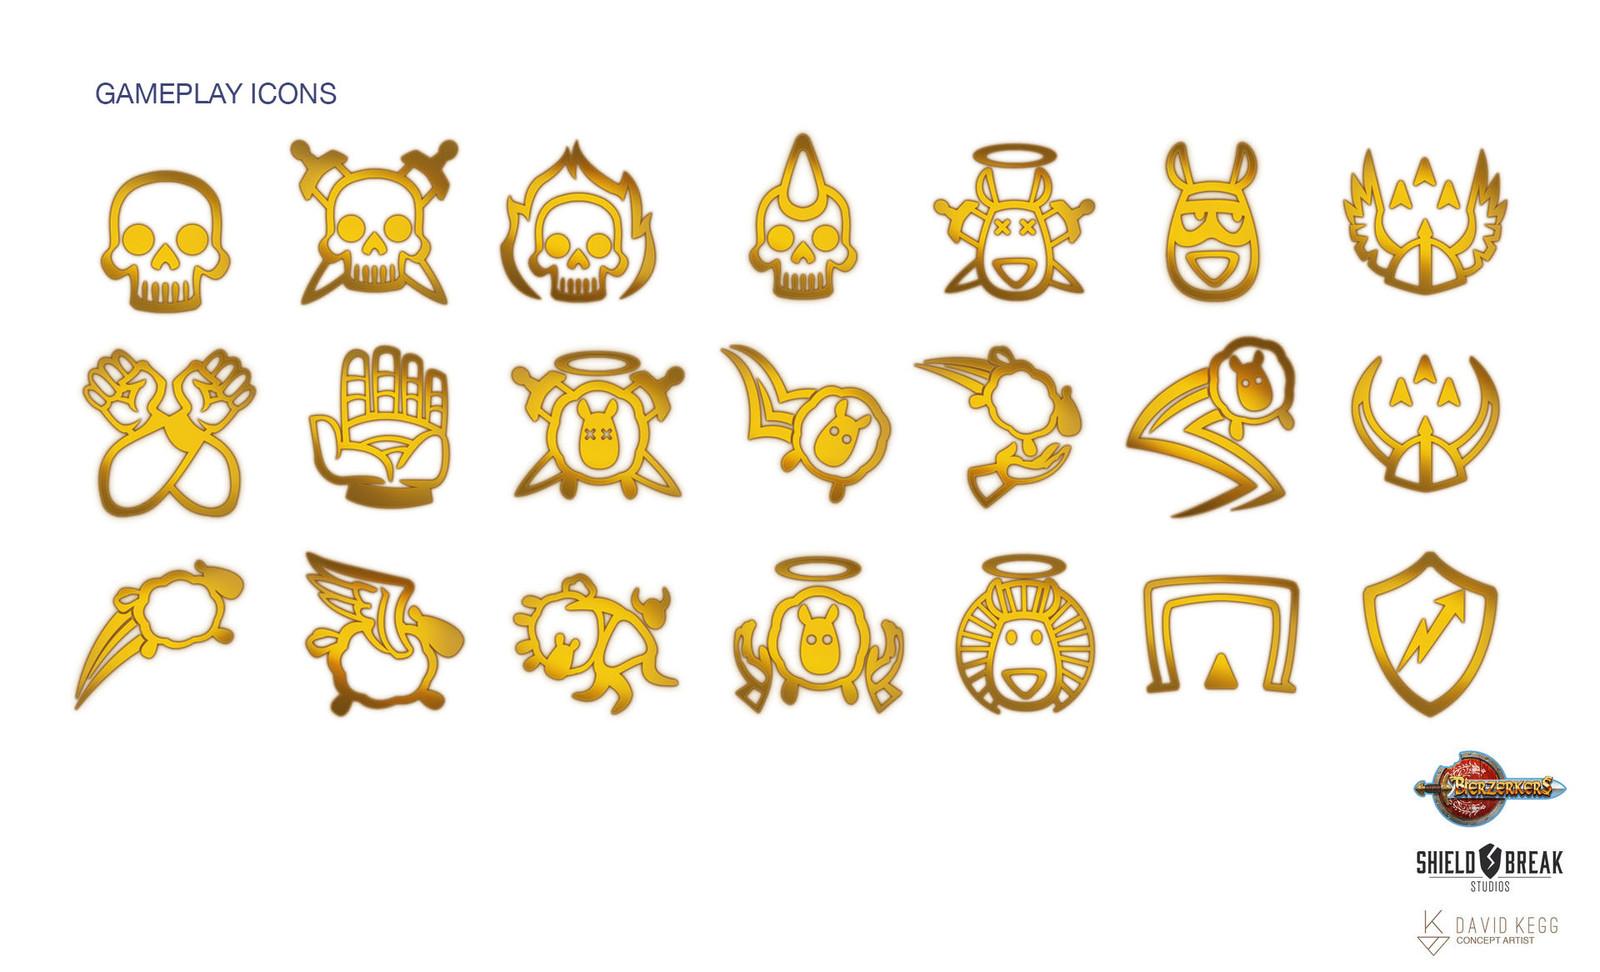 Gameplay Icons